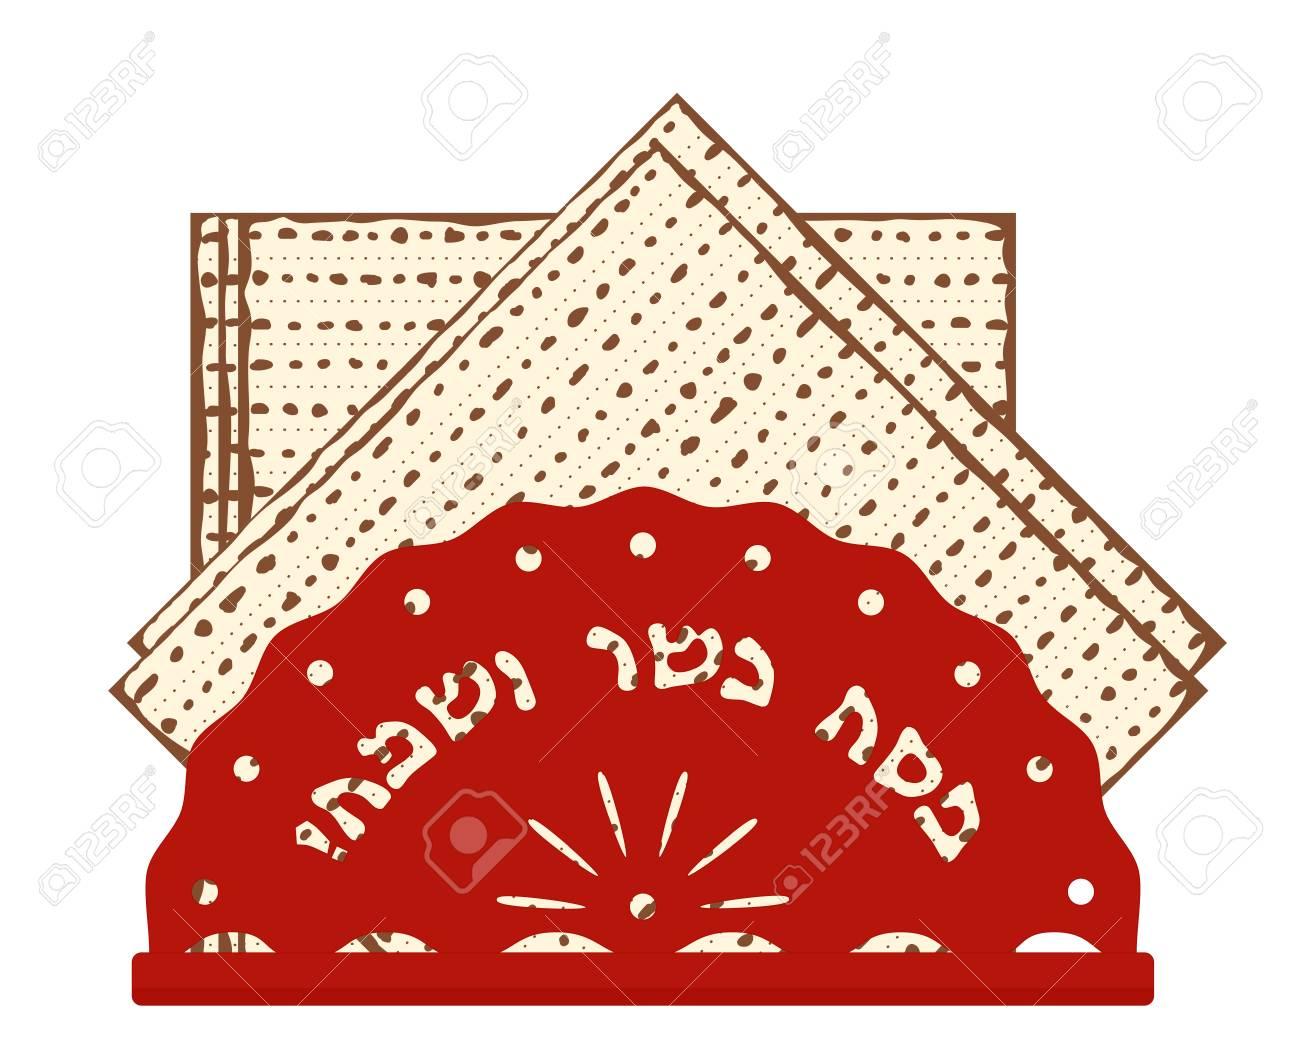 Jewish Holiday Of Passover Matzah Or Matzo Unleavened Bread